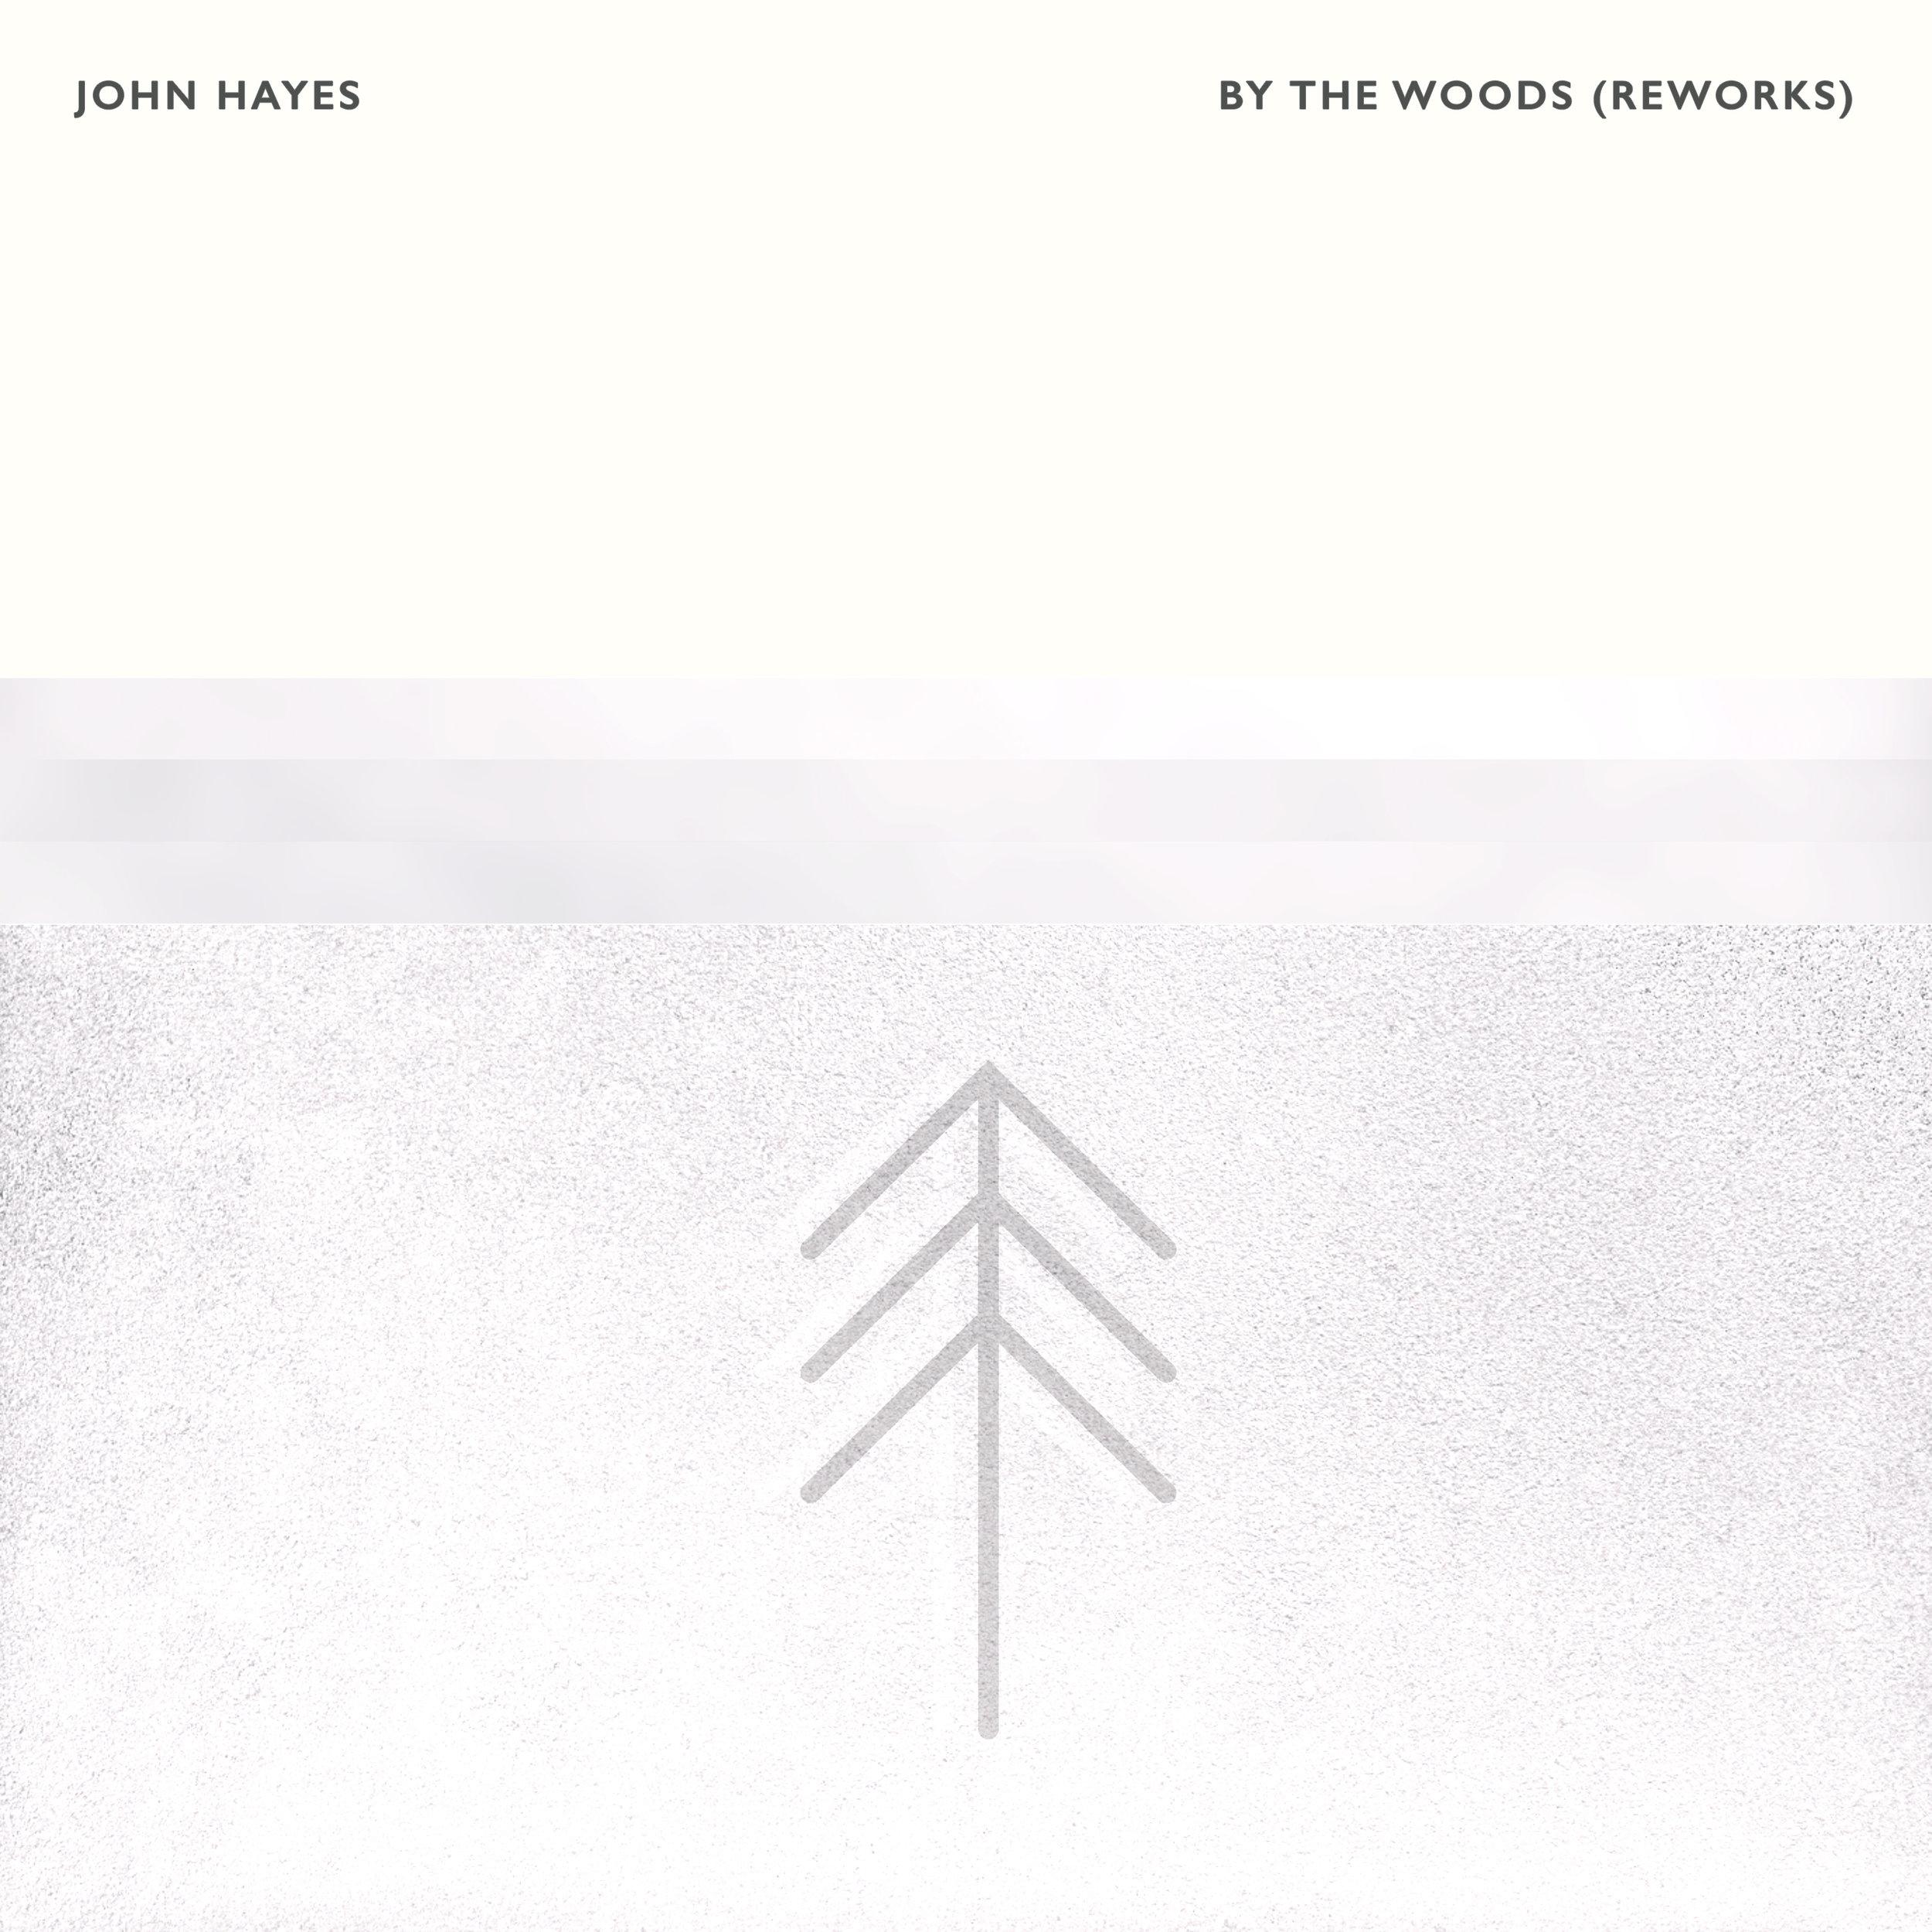 John Hayes - By the woods_reworks.jpg